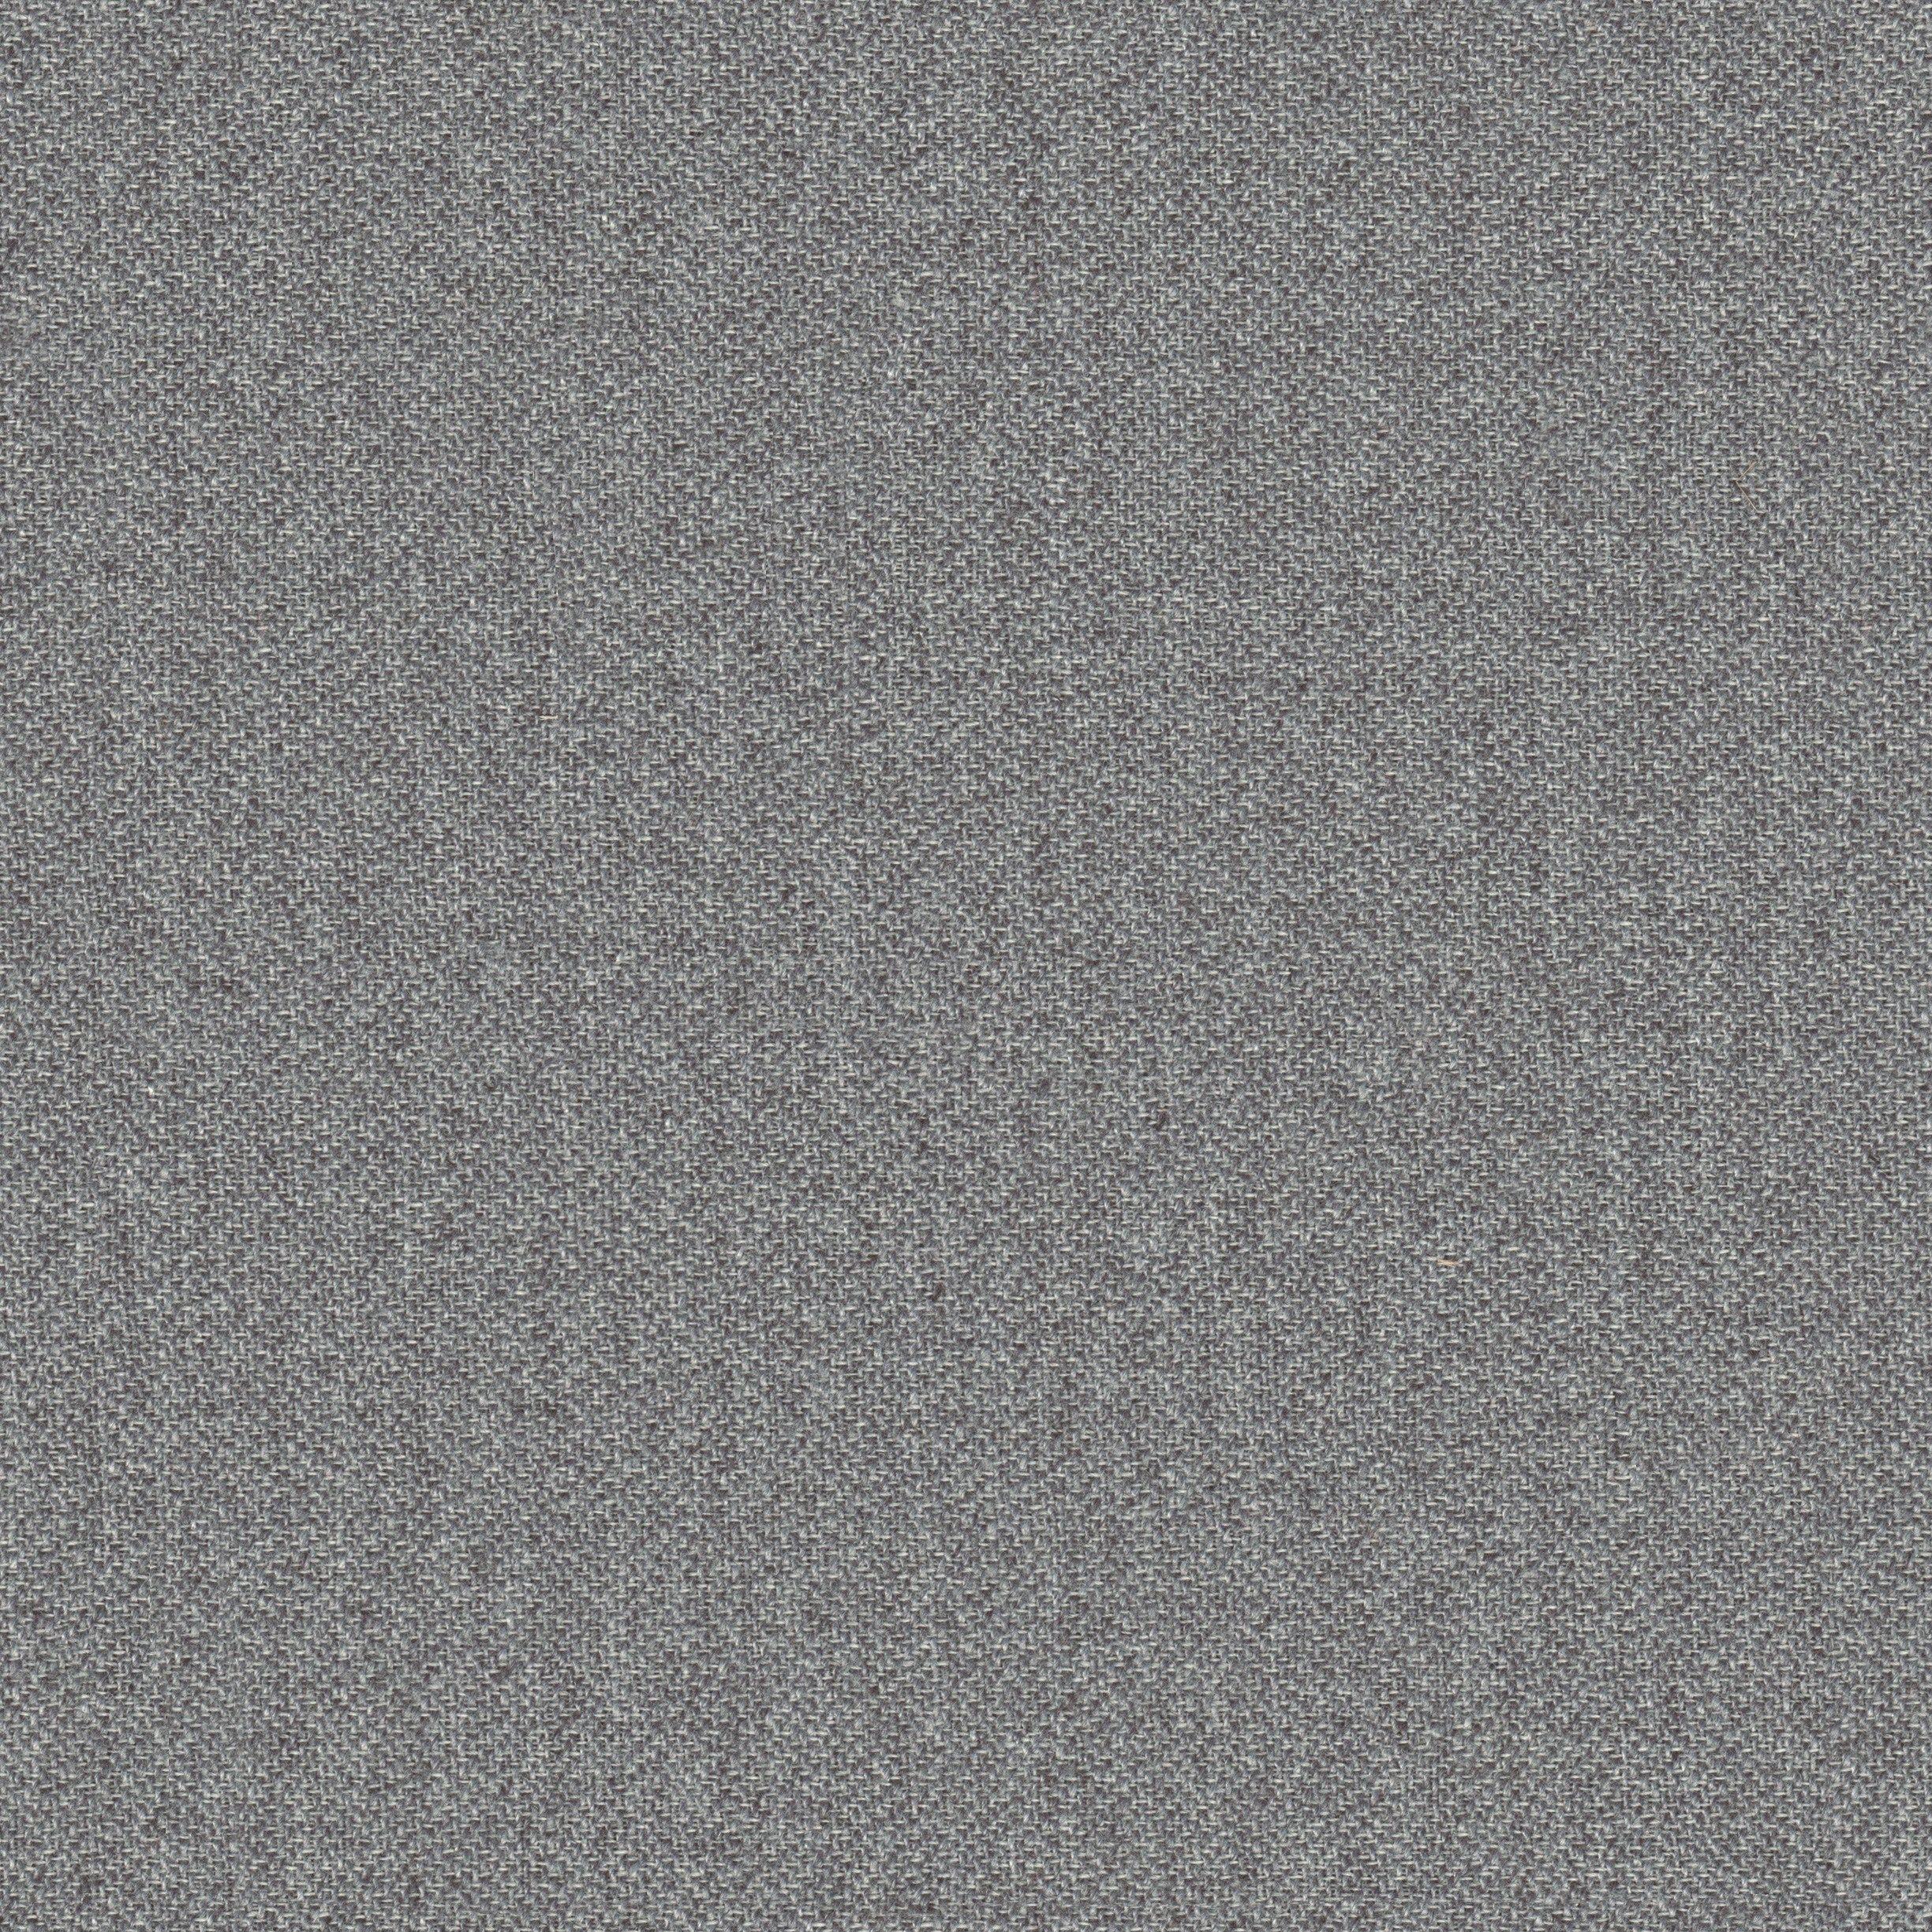 Free Fine Machine Woven Cloth Seamless Texture Seamless Textures Texture Tiles Texture